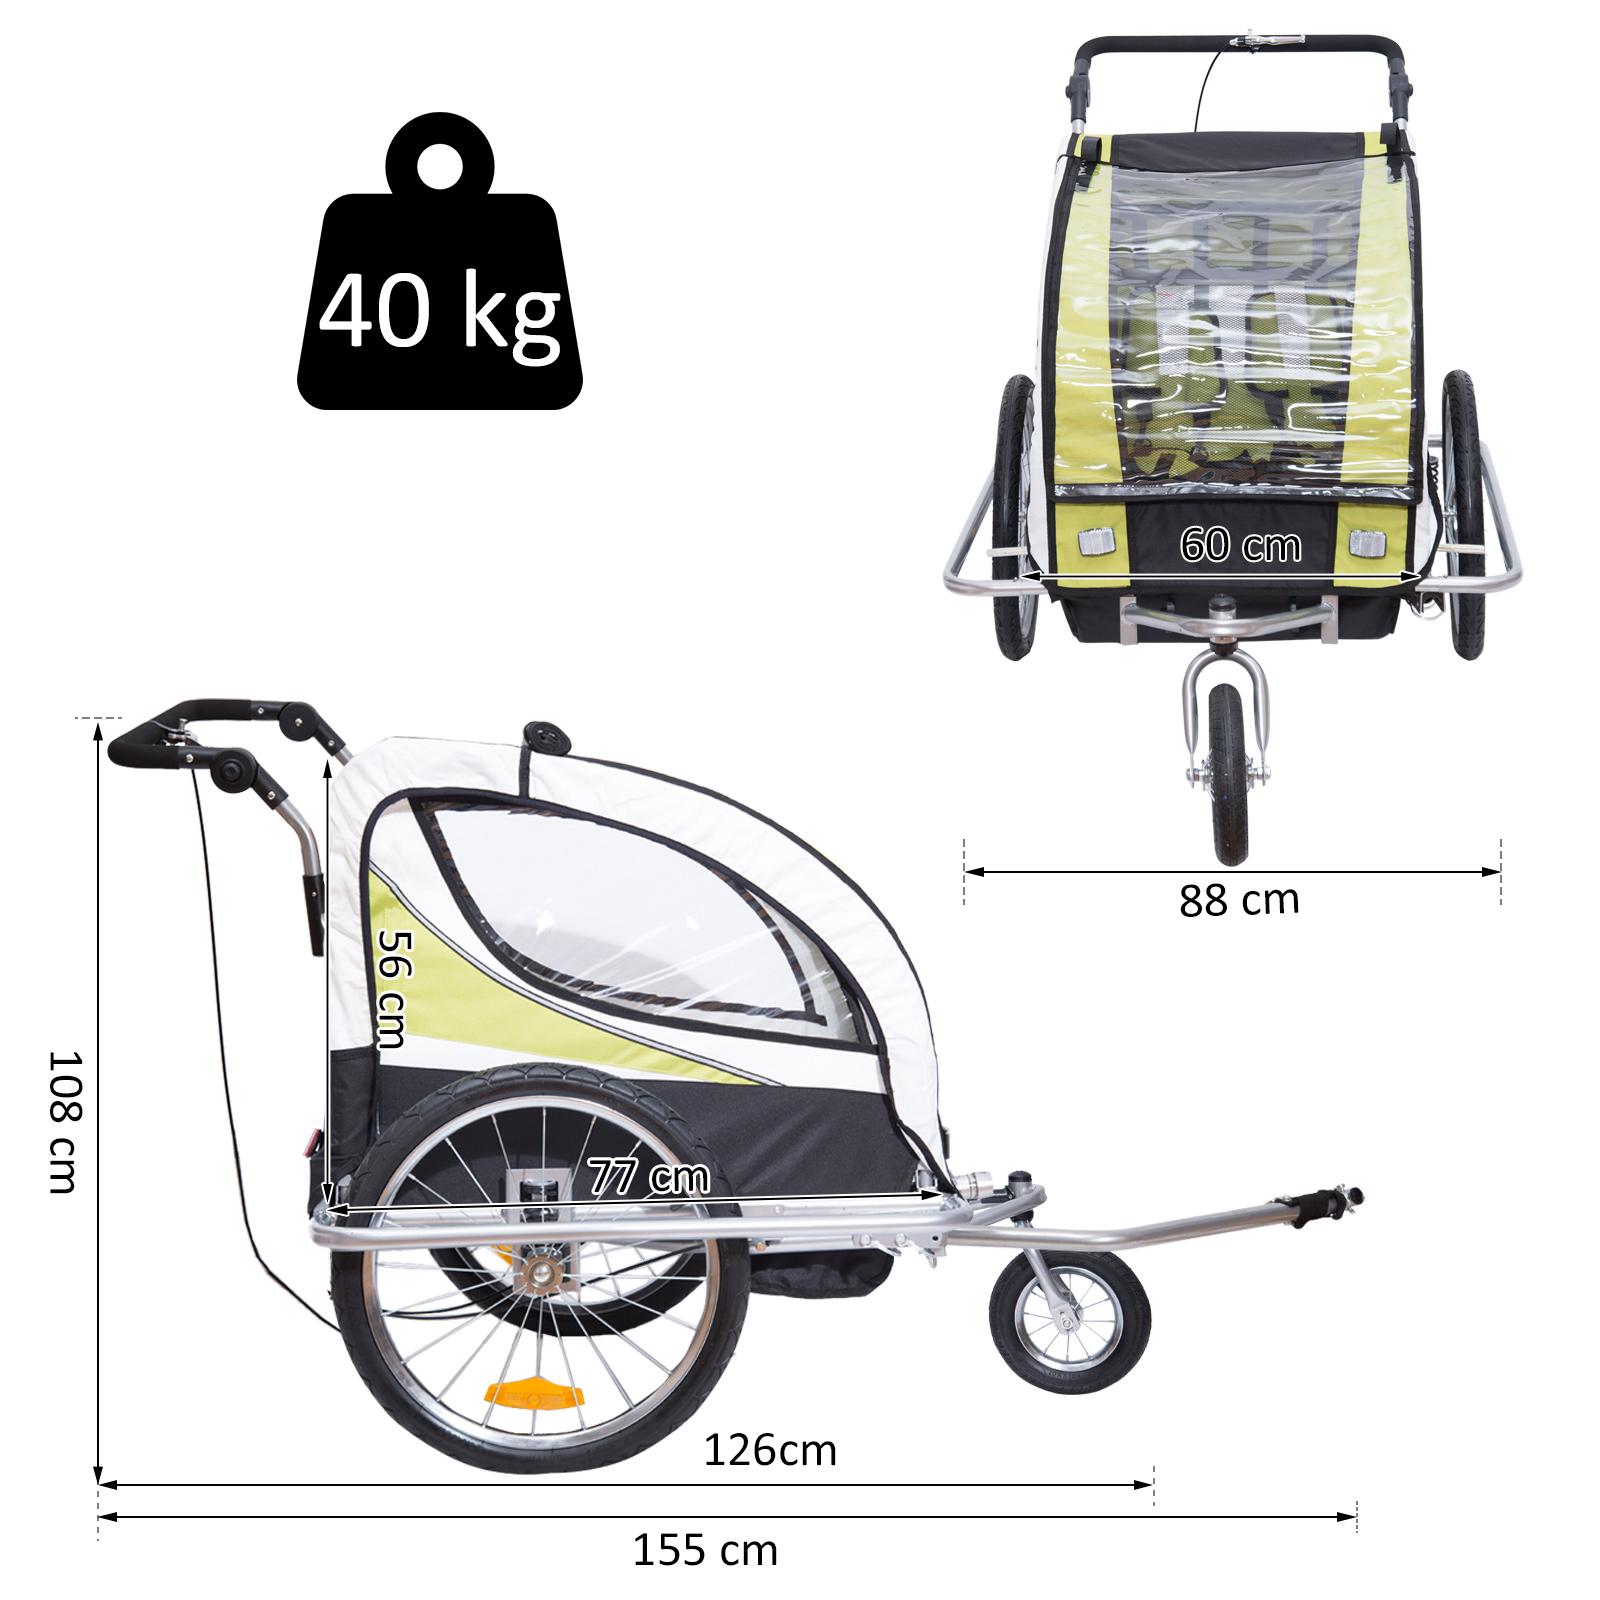 miniatura 32 - Remolque para Bicicleta tipo Carro con Barra de Paseo para Niños de 2 Plazas NUE